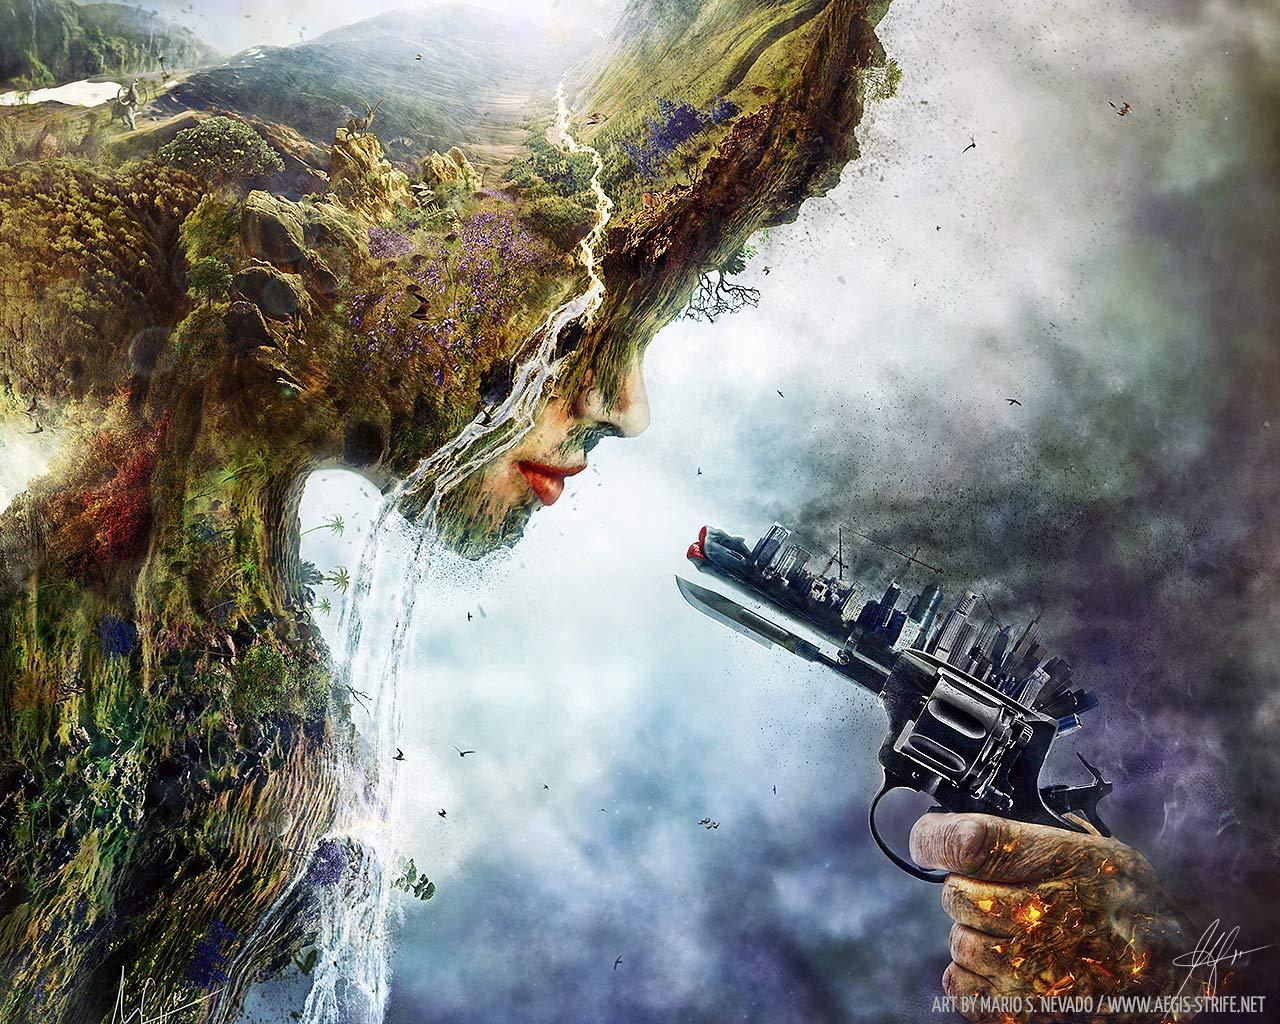 Nature Vs Industry Art